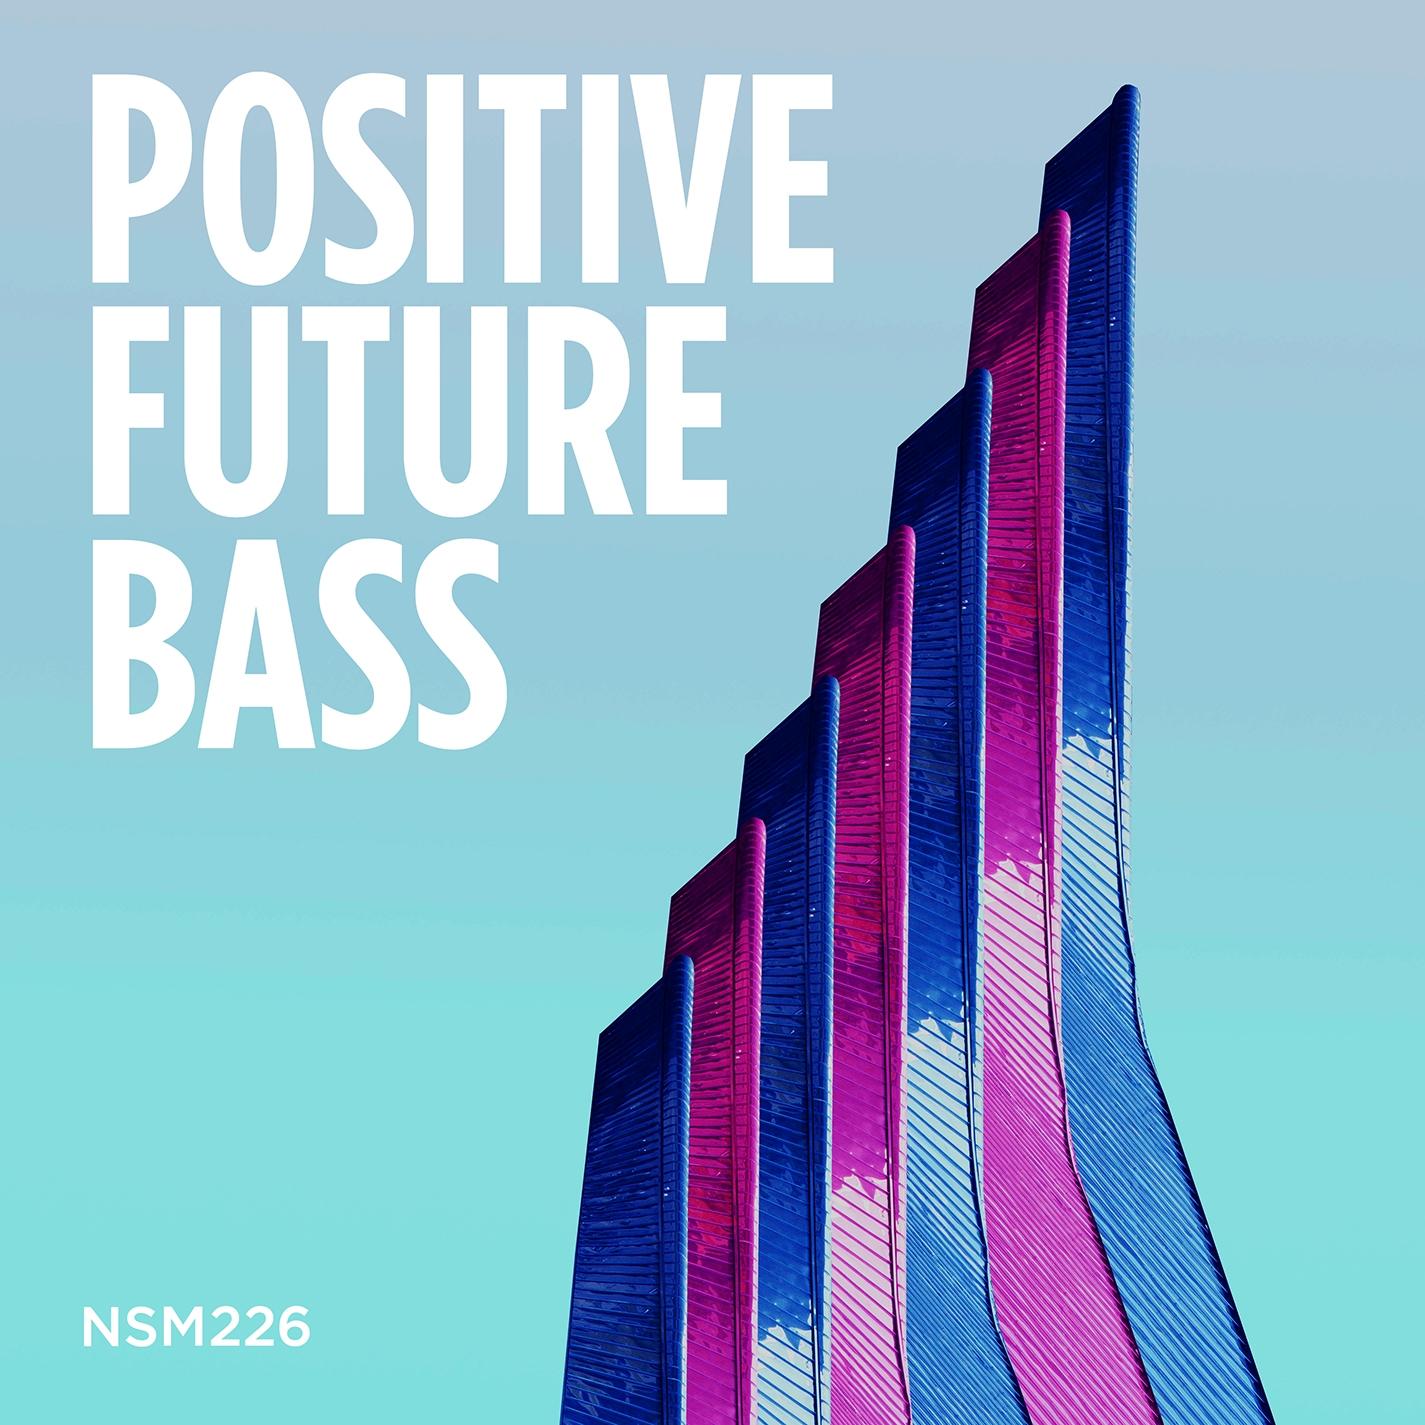 Positive Future Bass